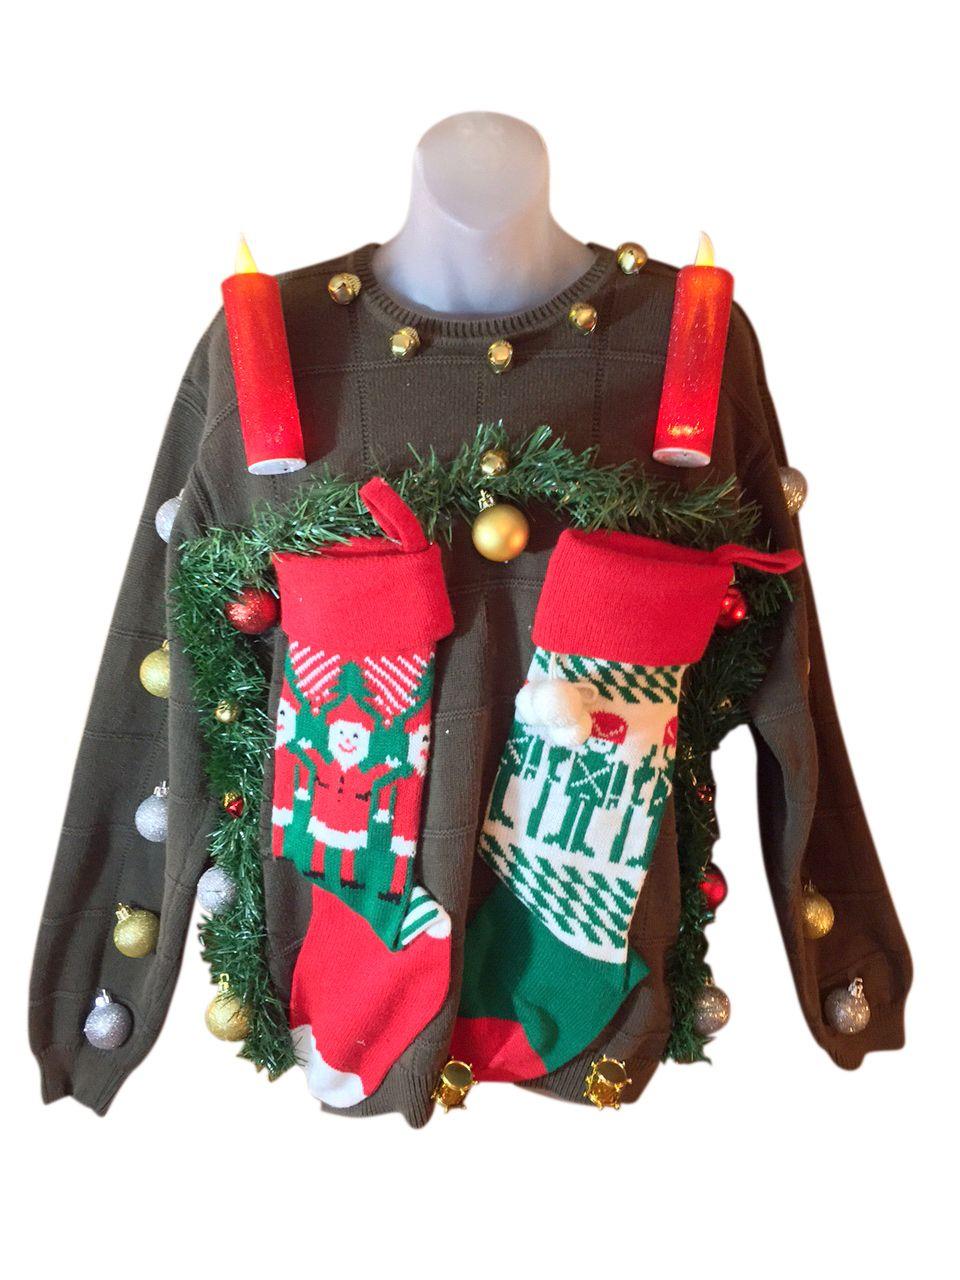 Custom Christmas Sweaters.Stockings And Fireplace Custom Christmas Sweater L 42 25